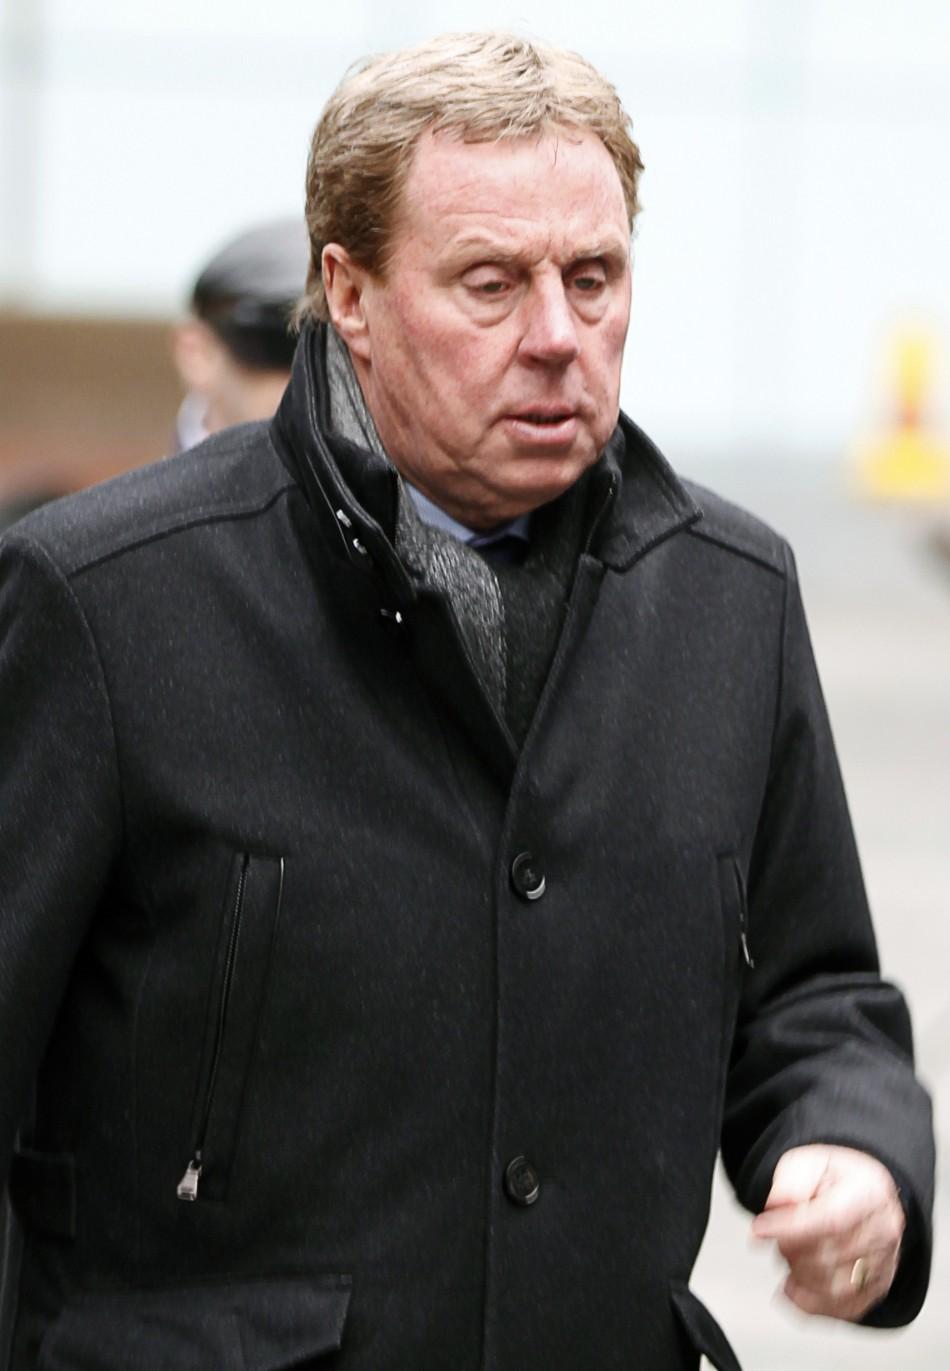 Harry Redknapp Trial: Defence of 'Odd Couple' Lambast 'Desperate' Prosecution